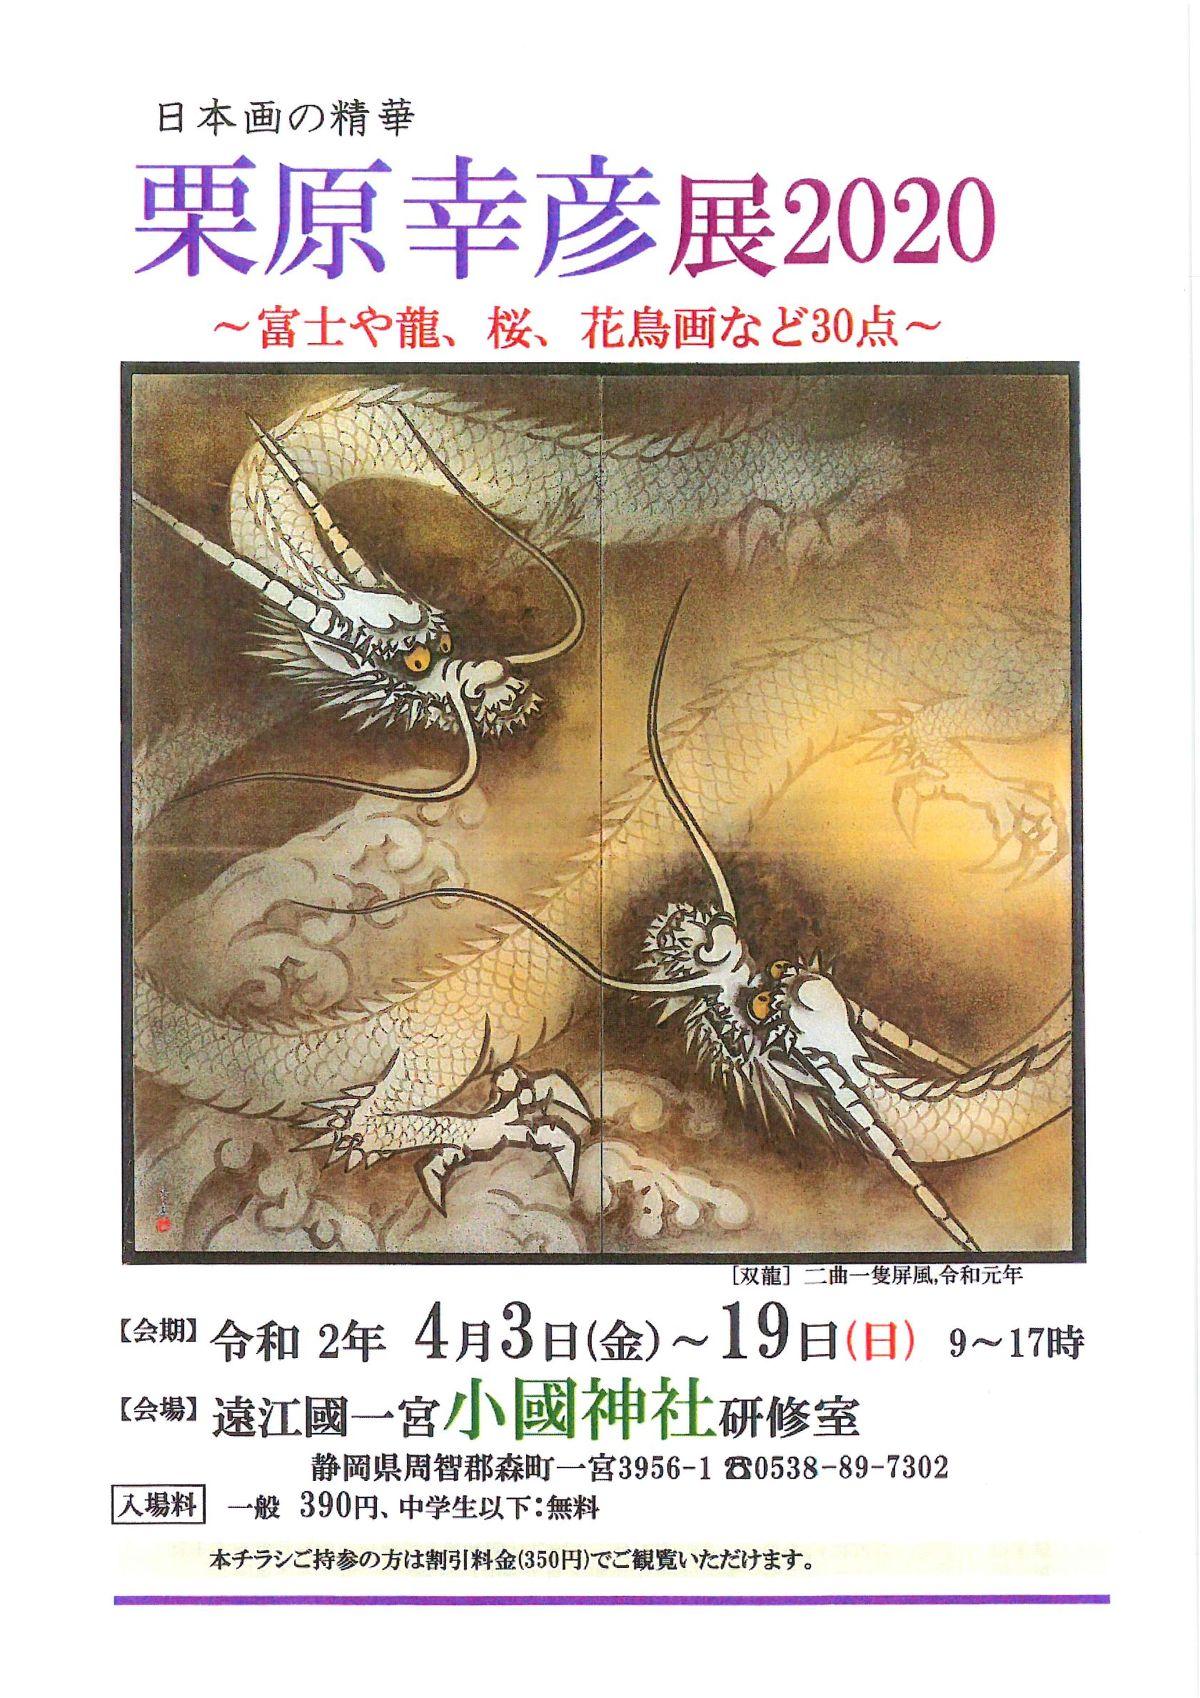 「日本画の精華・栗原幸彦展 2020」の開催!!!!